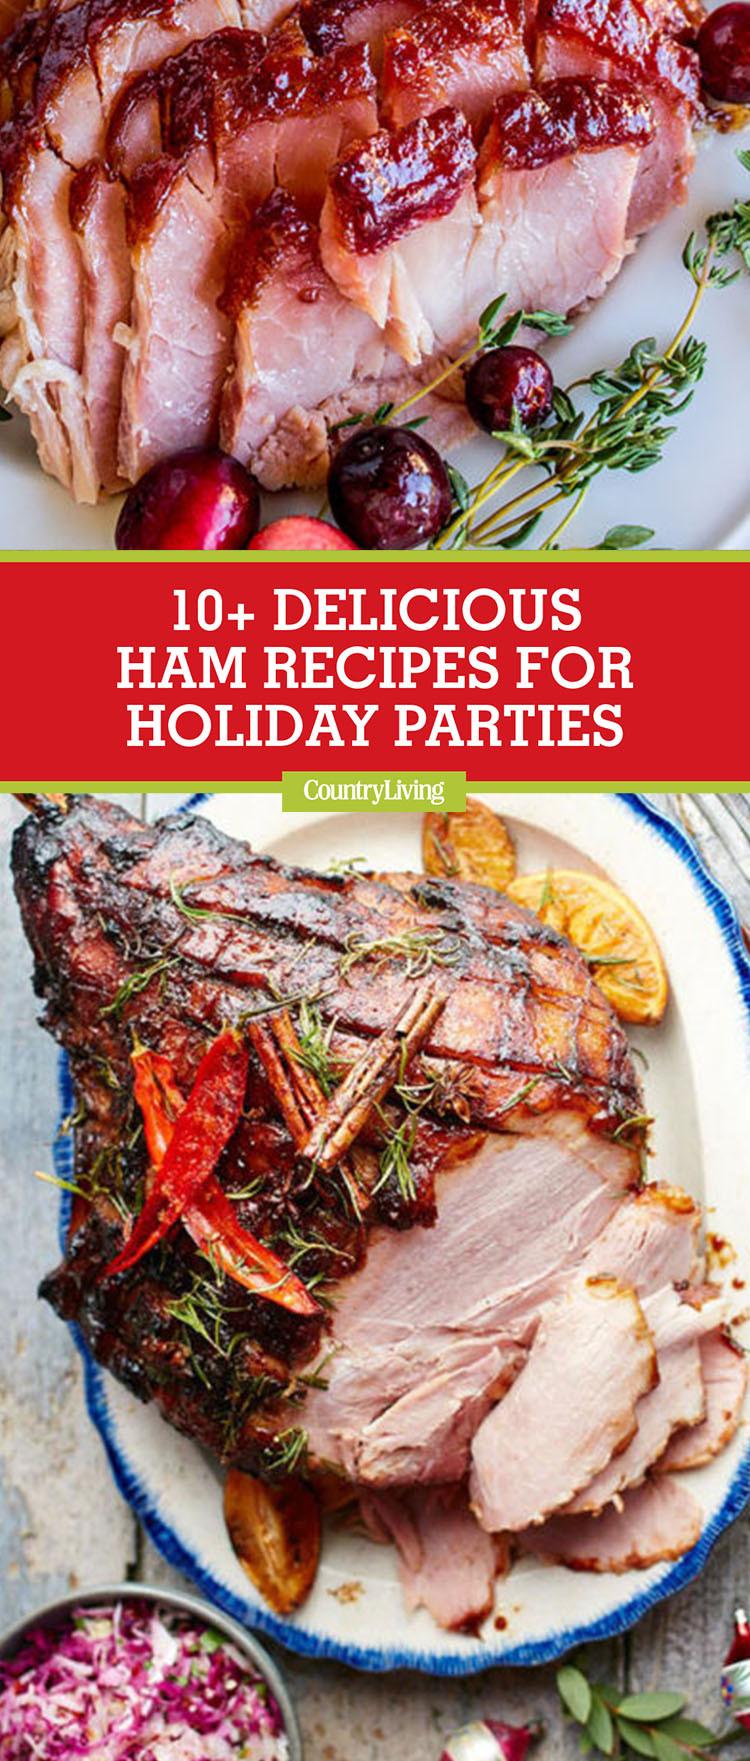 Christmas Ham Dinner Menu  10 Christmas Ham Dinner Recipes How to Cook a Christmas Ham